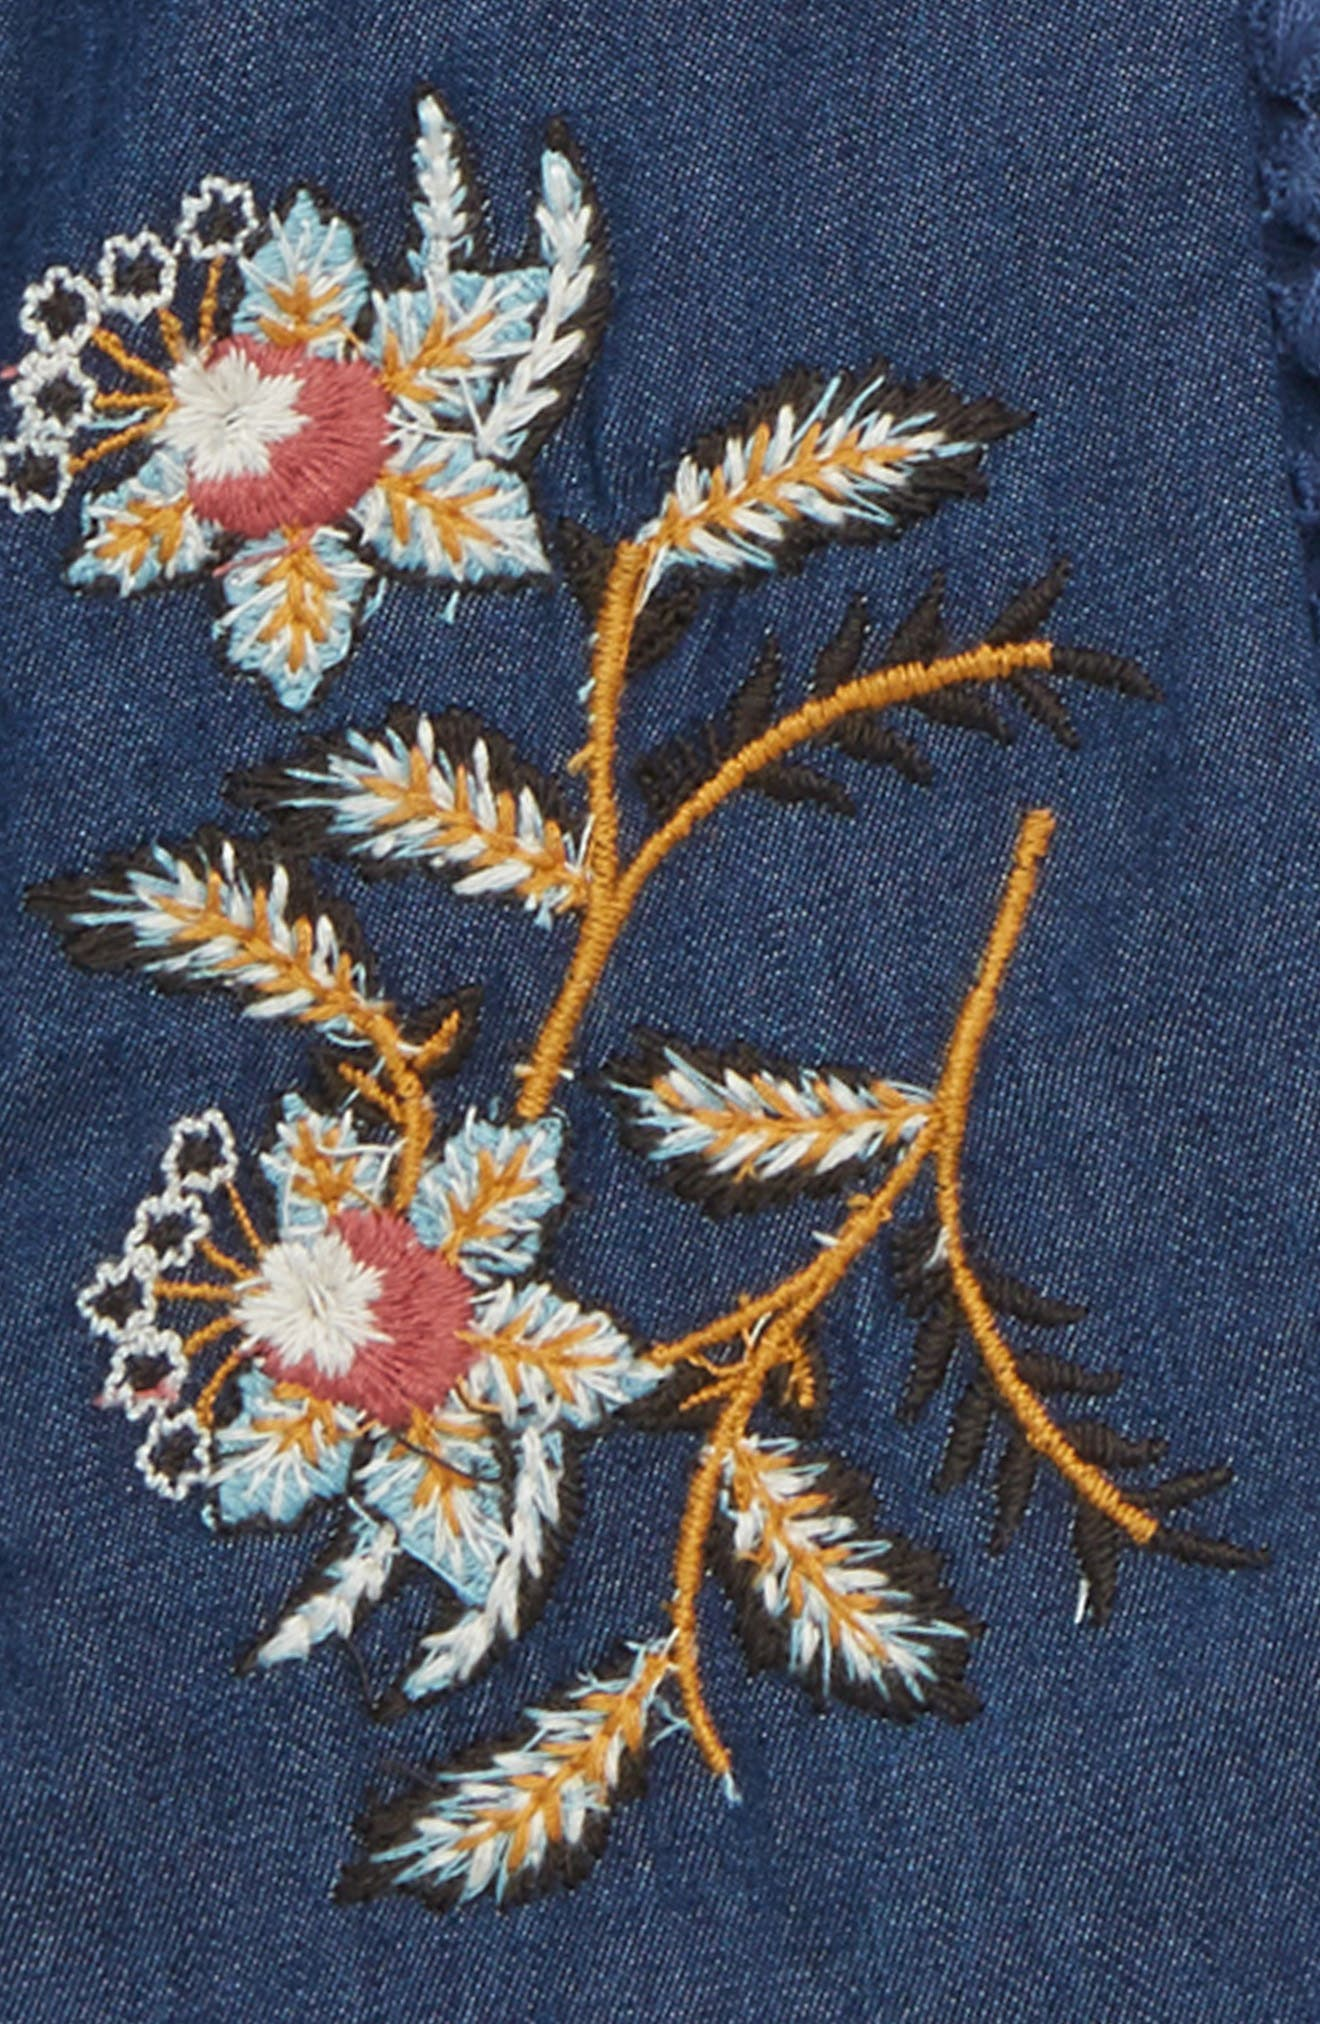 Peek Willow Embroidered Denim Dress,                             Alternate thumbnail 2, color,                             NAVY